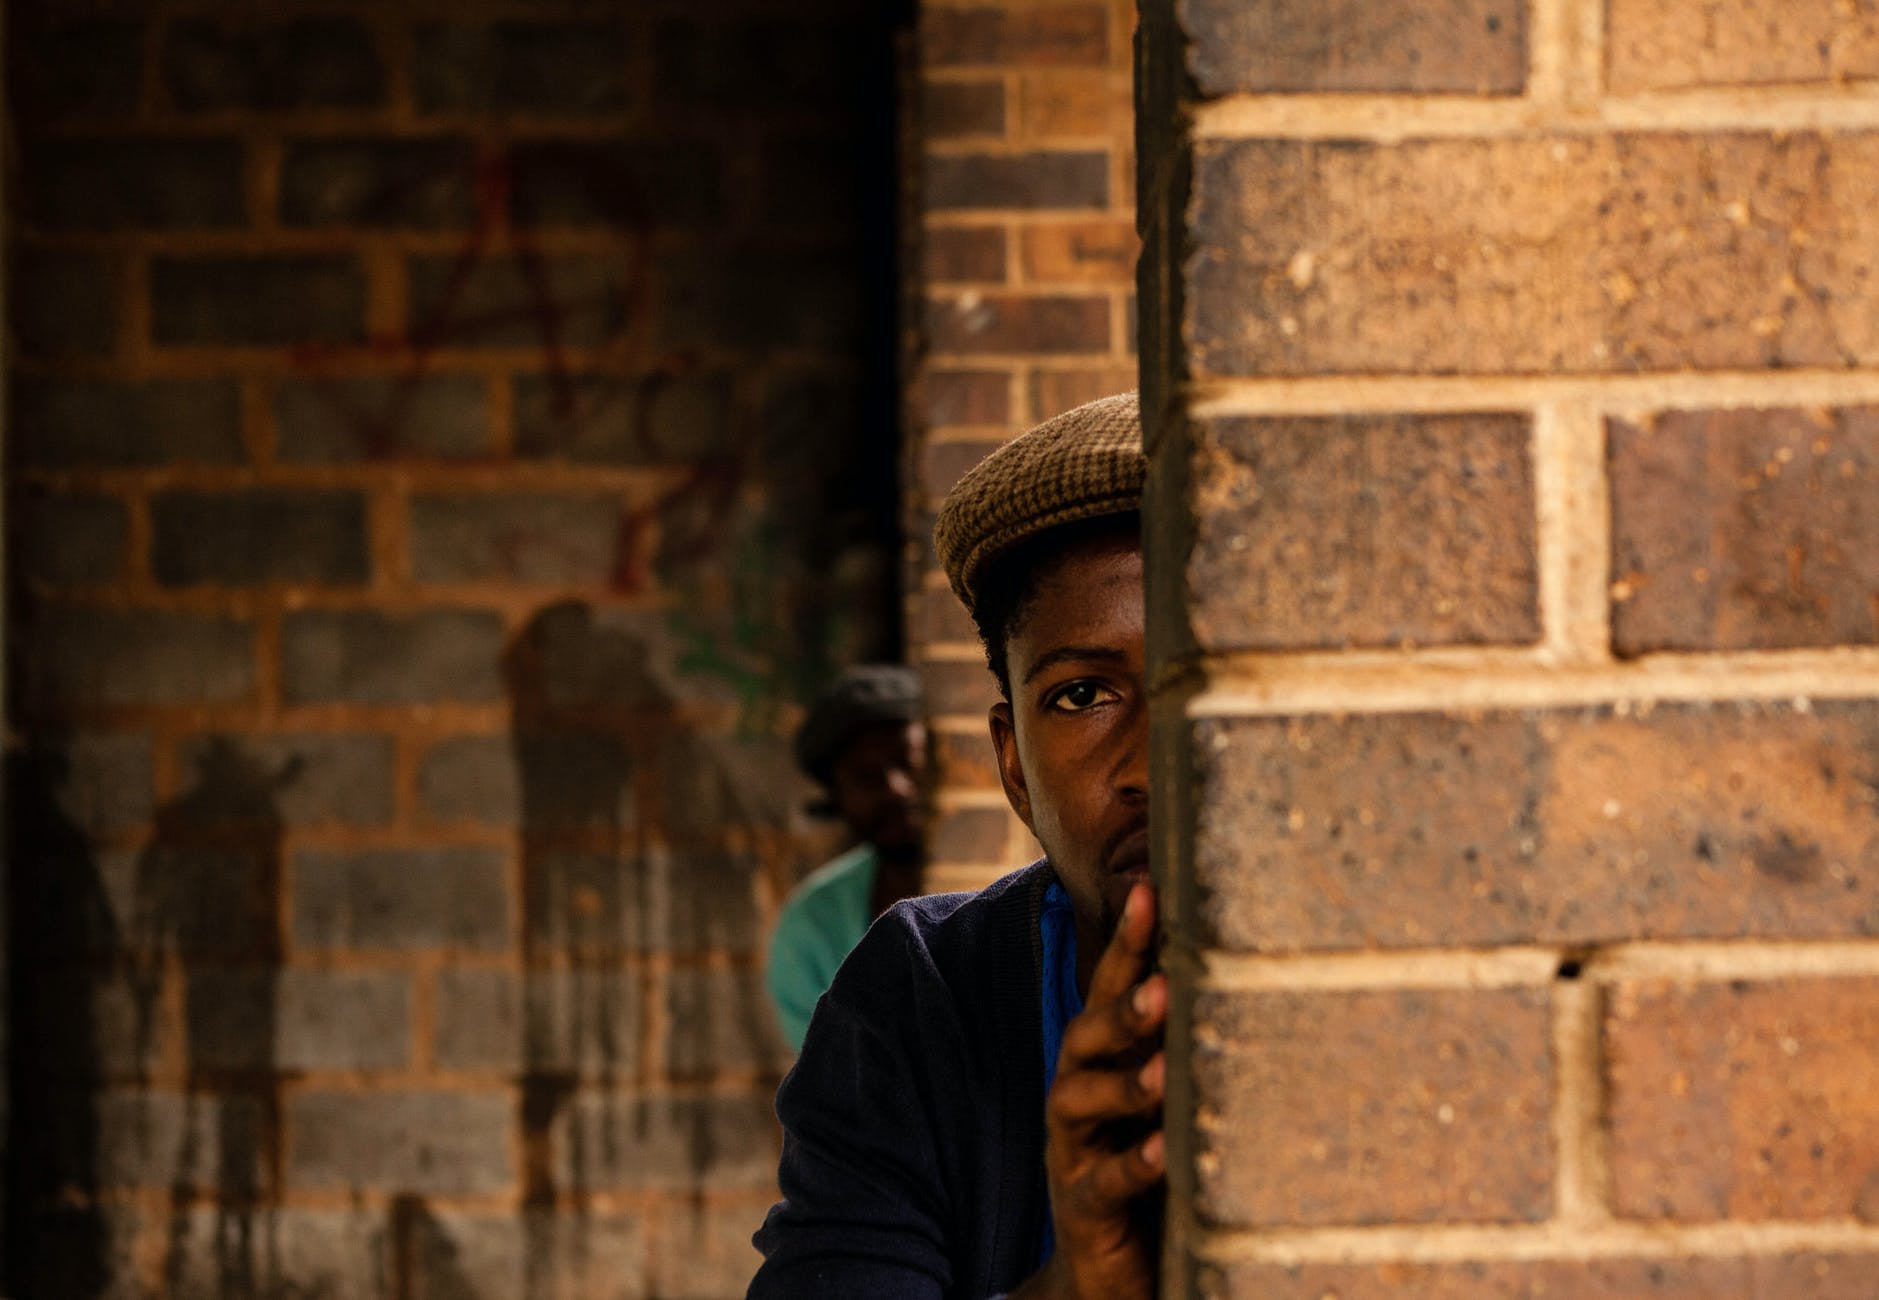 black scared men hiding behind shabby brick walls